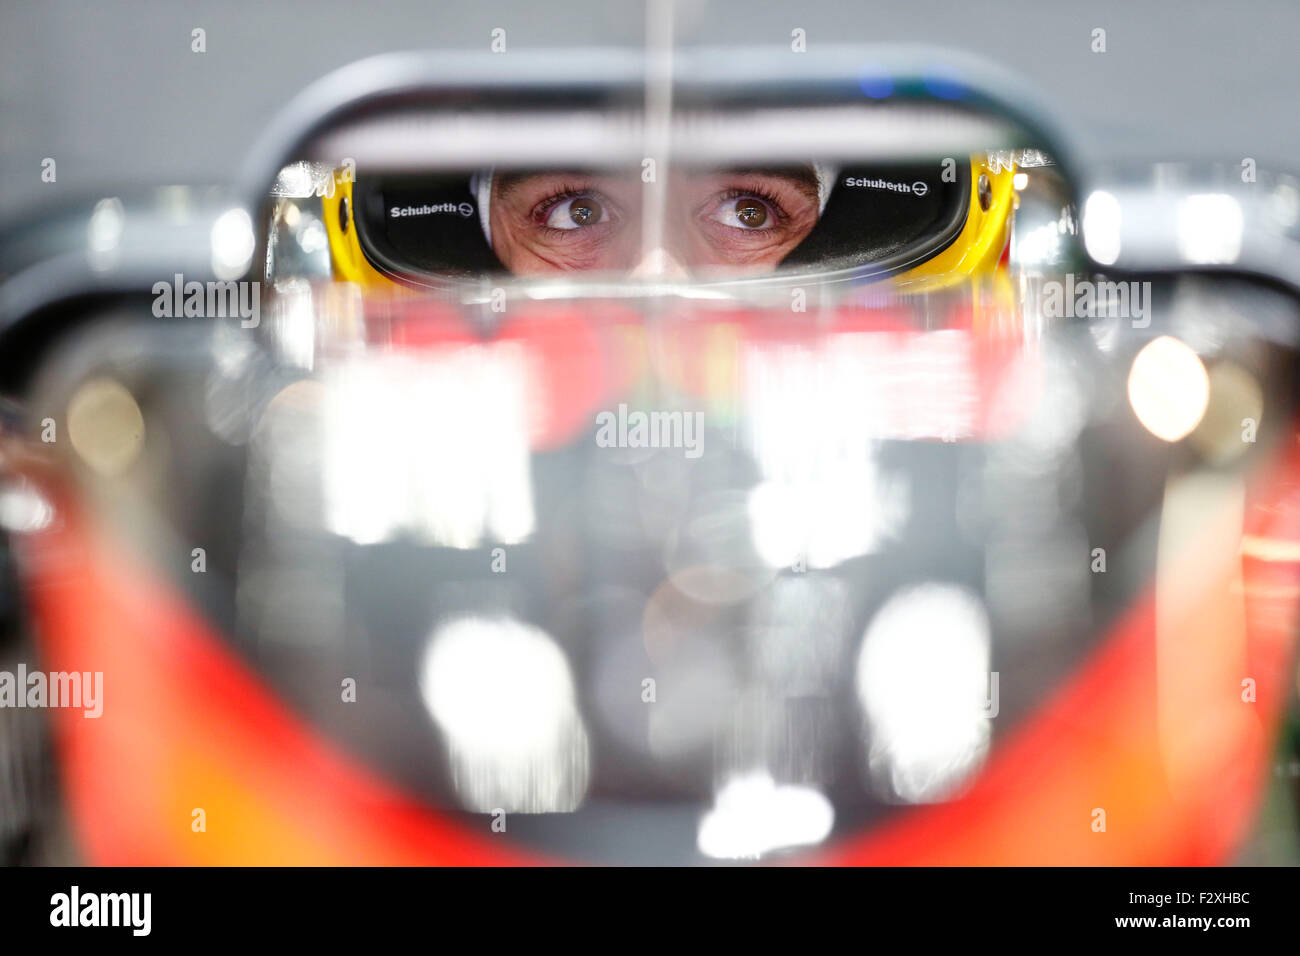 Motorsport: FIA Formel 1 Weltmeisterschaft 2015, Grand Prix von Japan, #14 Fernando Alonso (ESP, McLaren-Honda), Stockbild